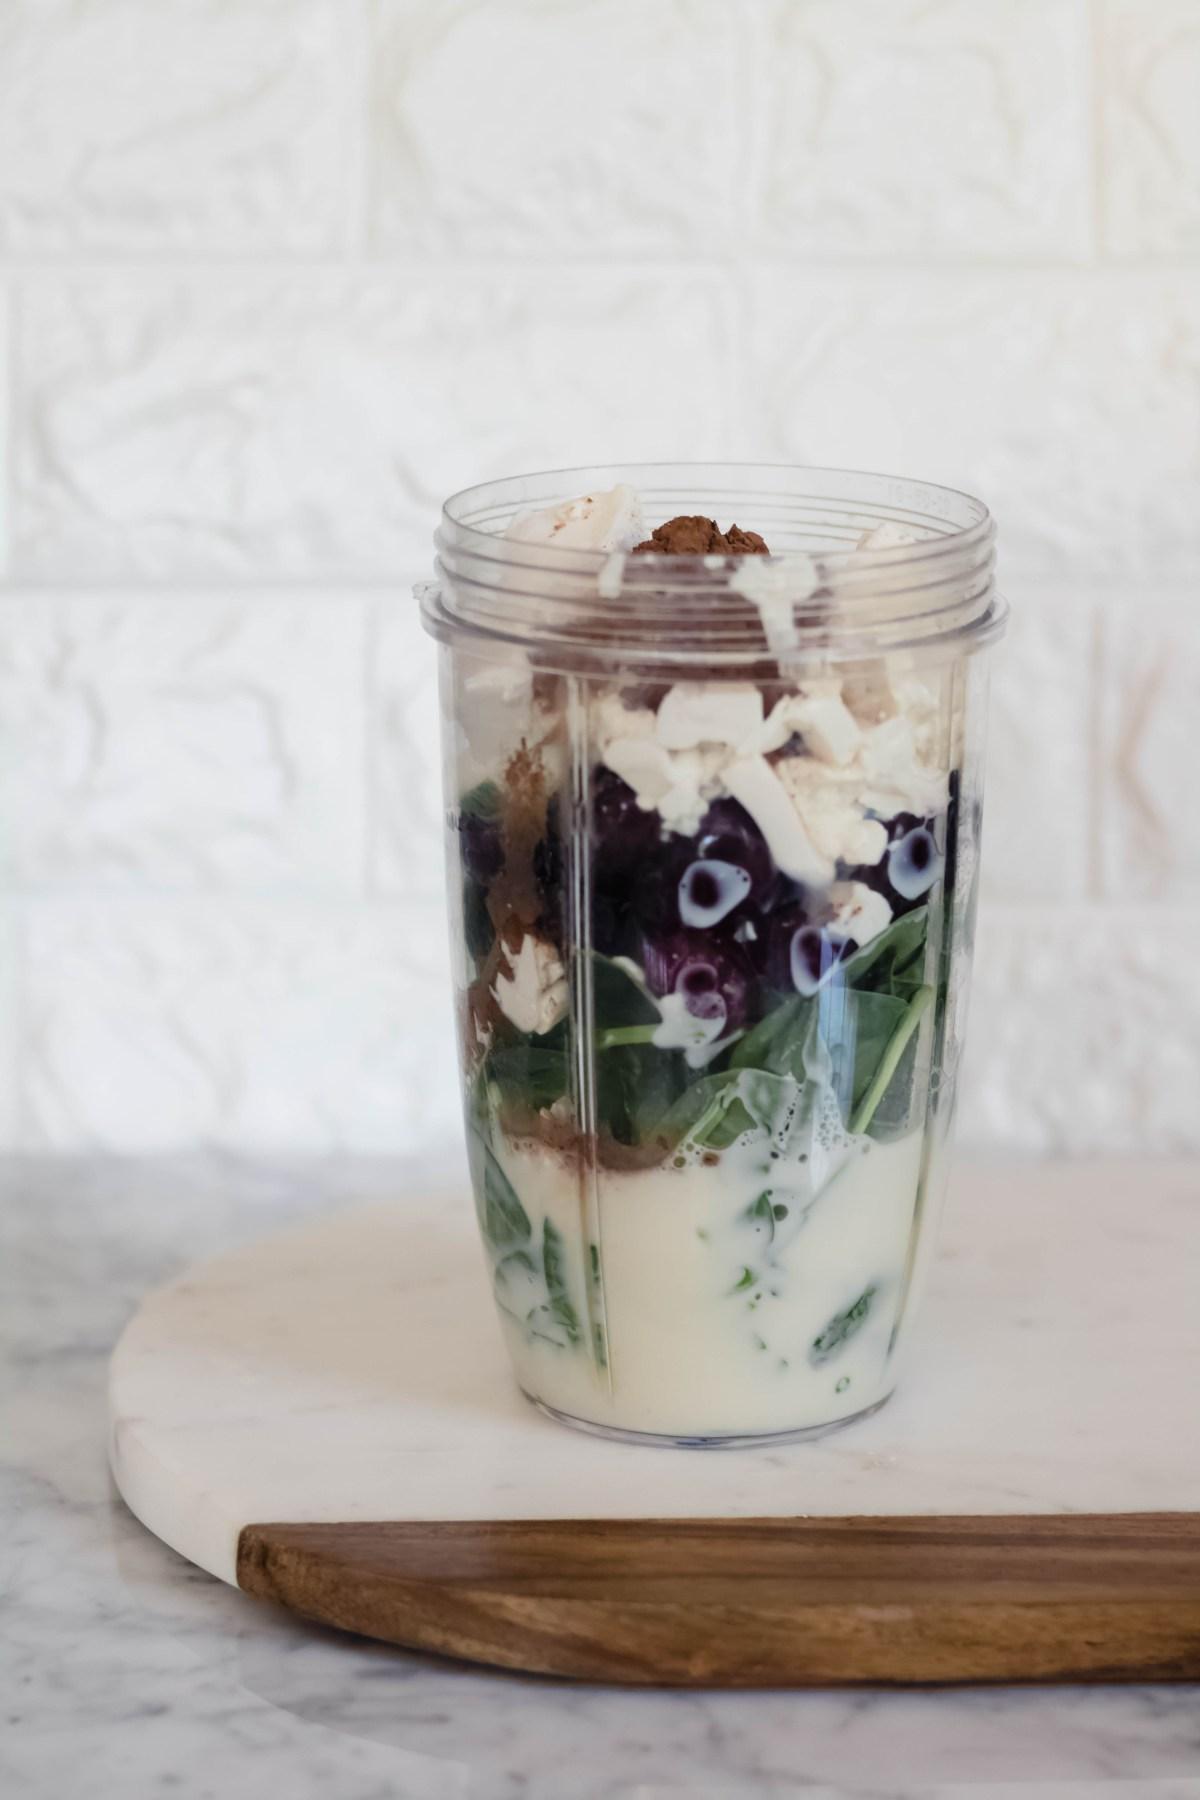 Vegan High protein chocolate smoothie